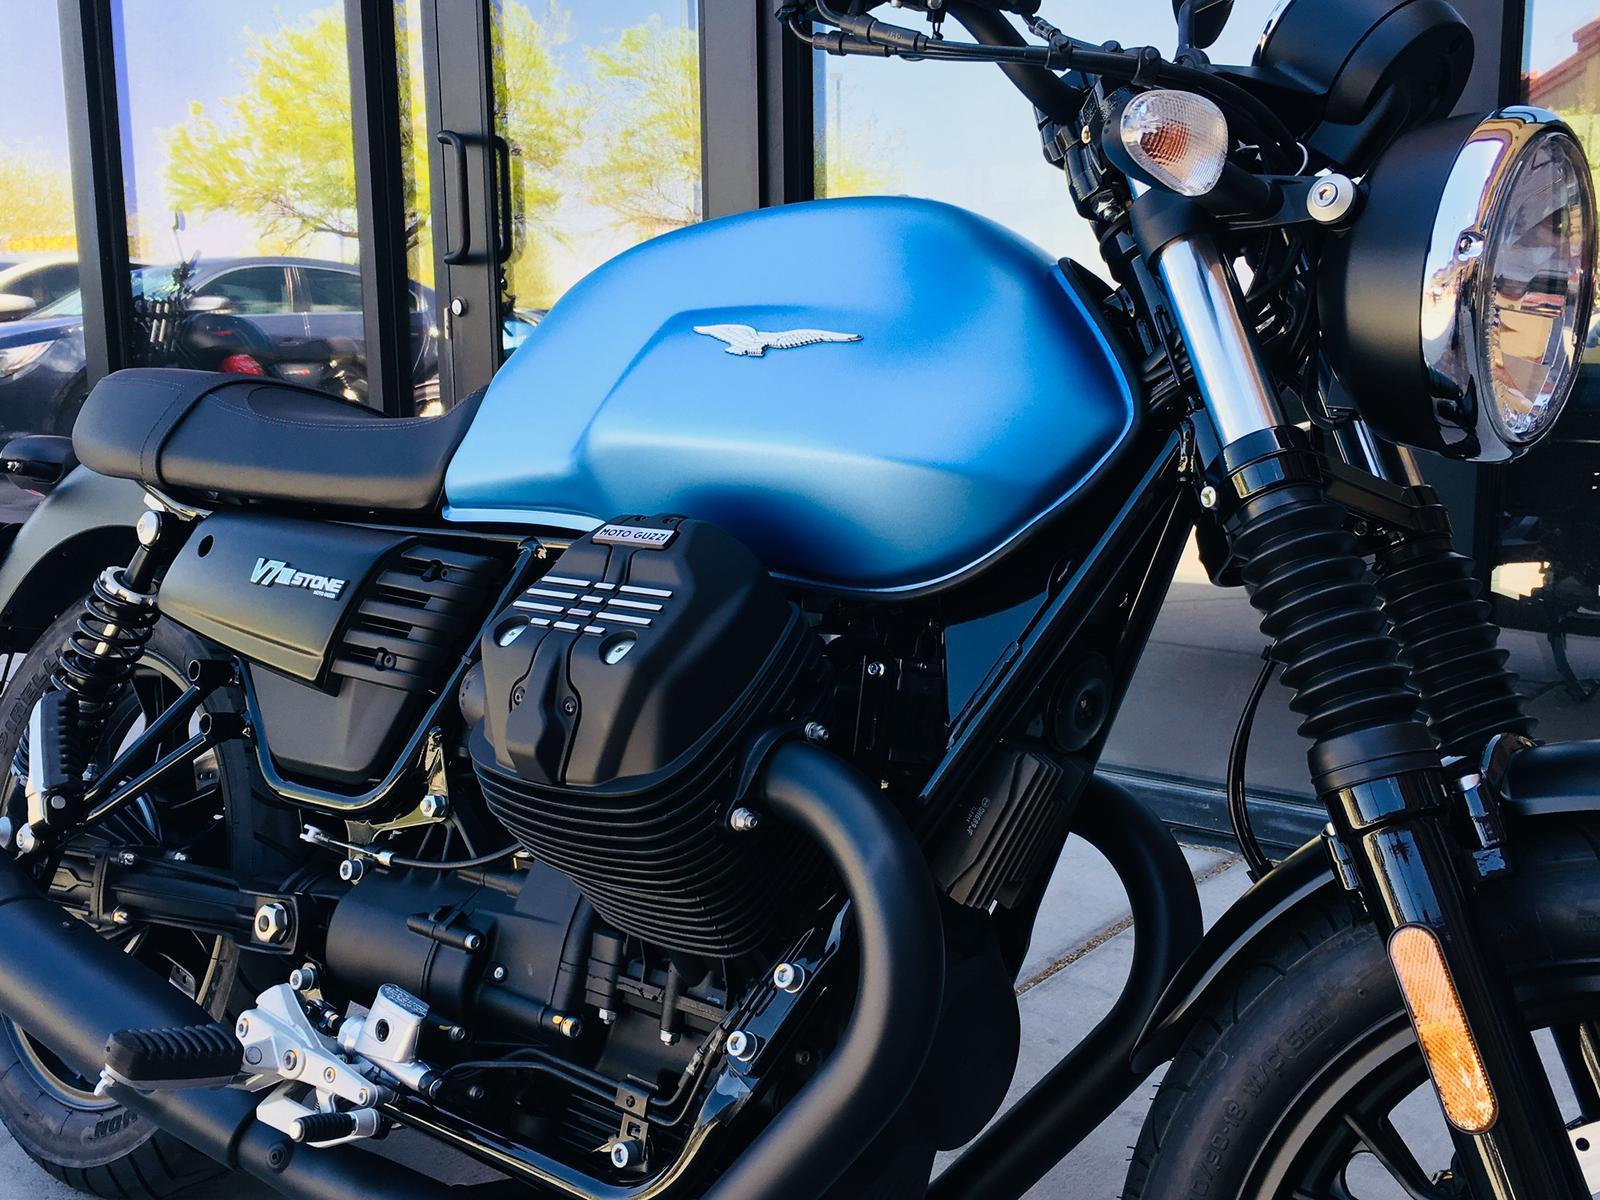 2018 Moto Guzzi V7 Iii Stone For Sale In Las Vegas Nv Freedom Euro